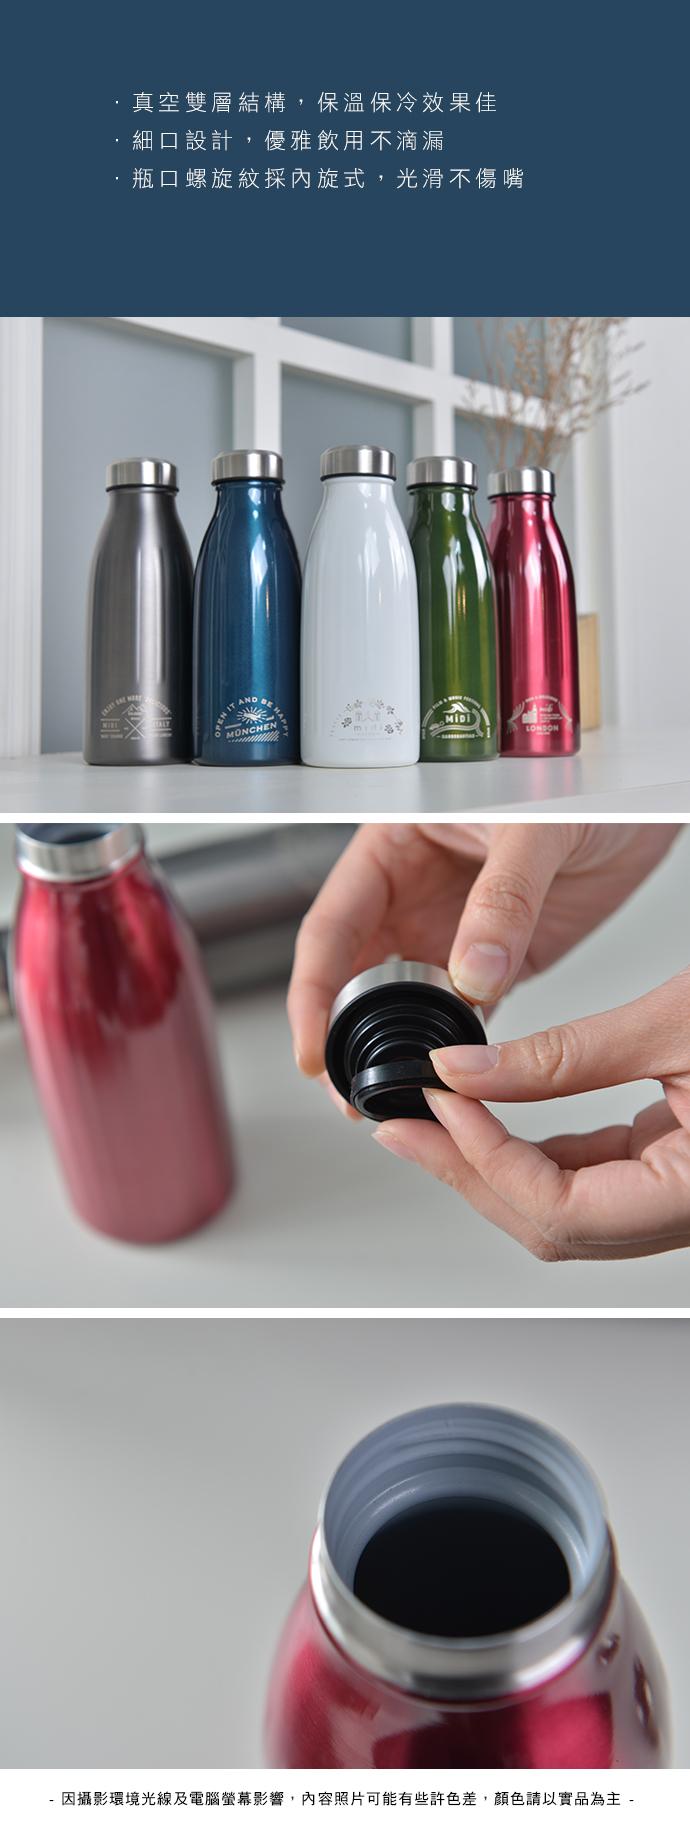 CB Japan|MiDi 城市系列雙層保冷保溫瓶350ml - 粉紅桃